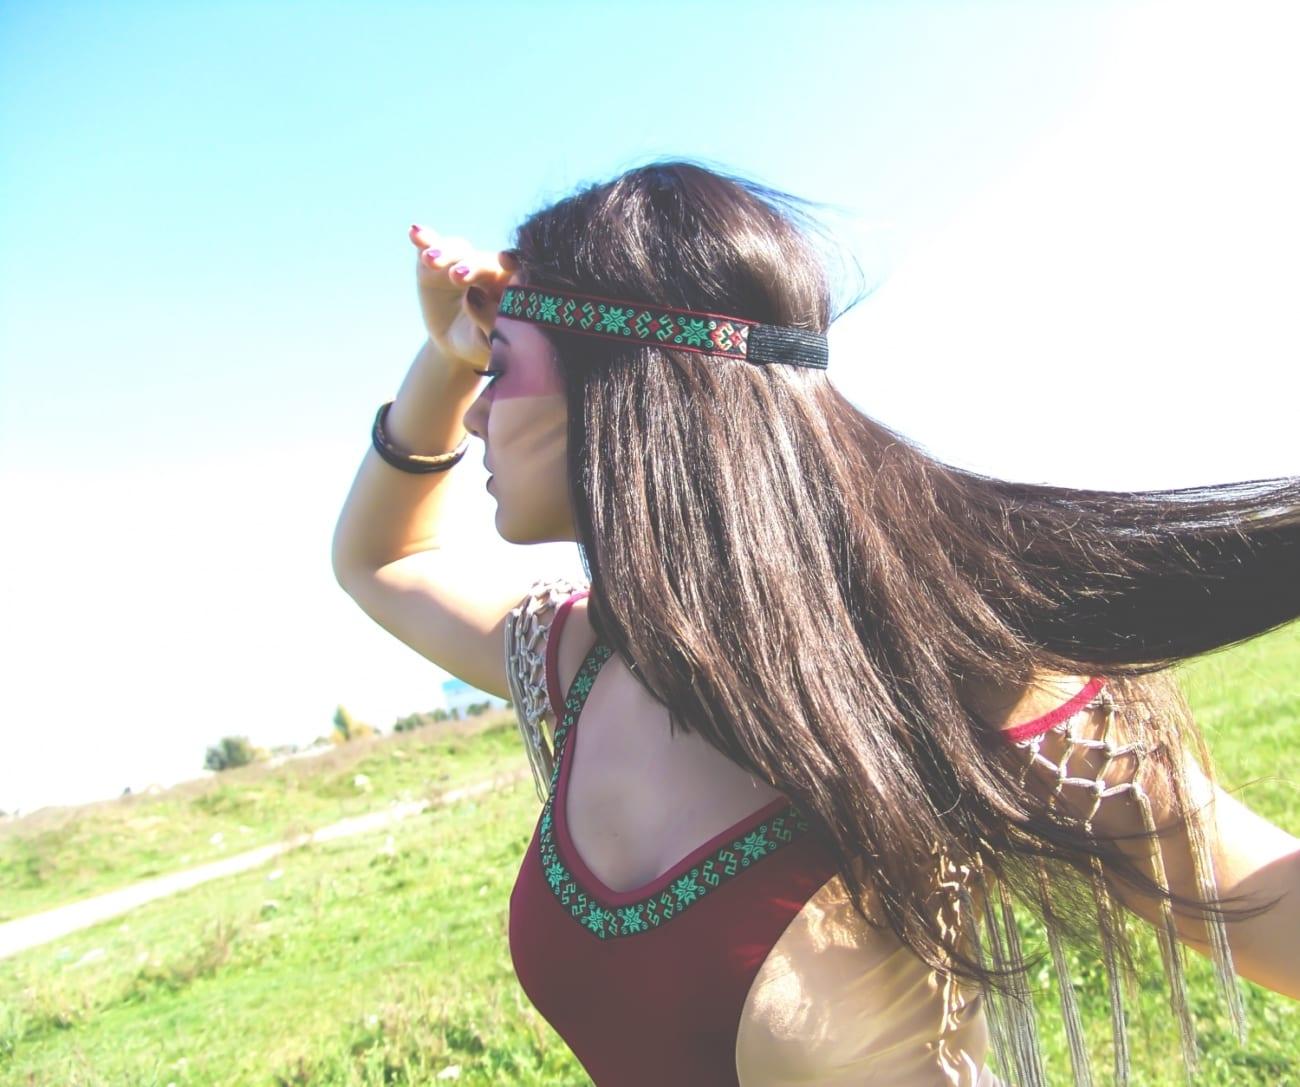 roxi rose fashion blog romania halloween indian native costume wildfashion (2)